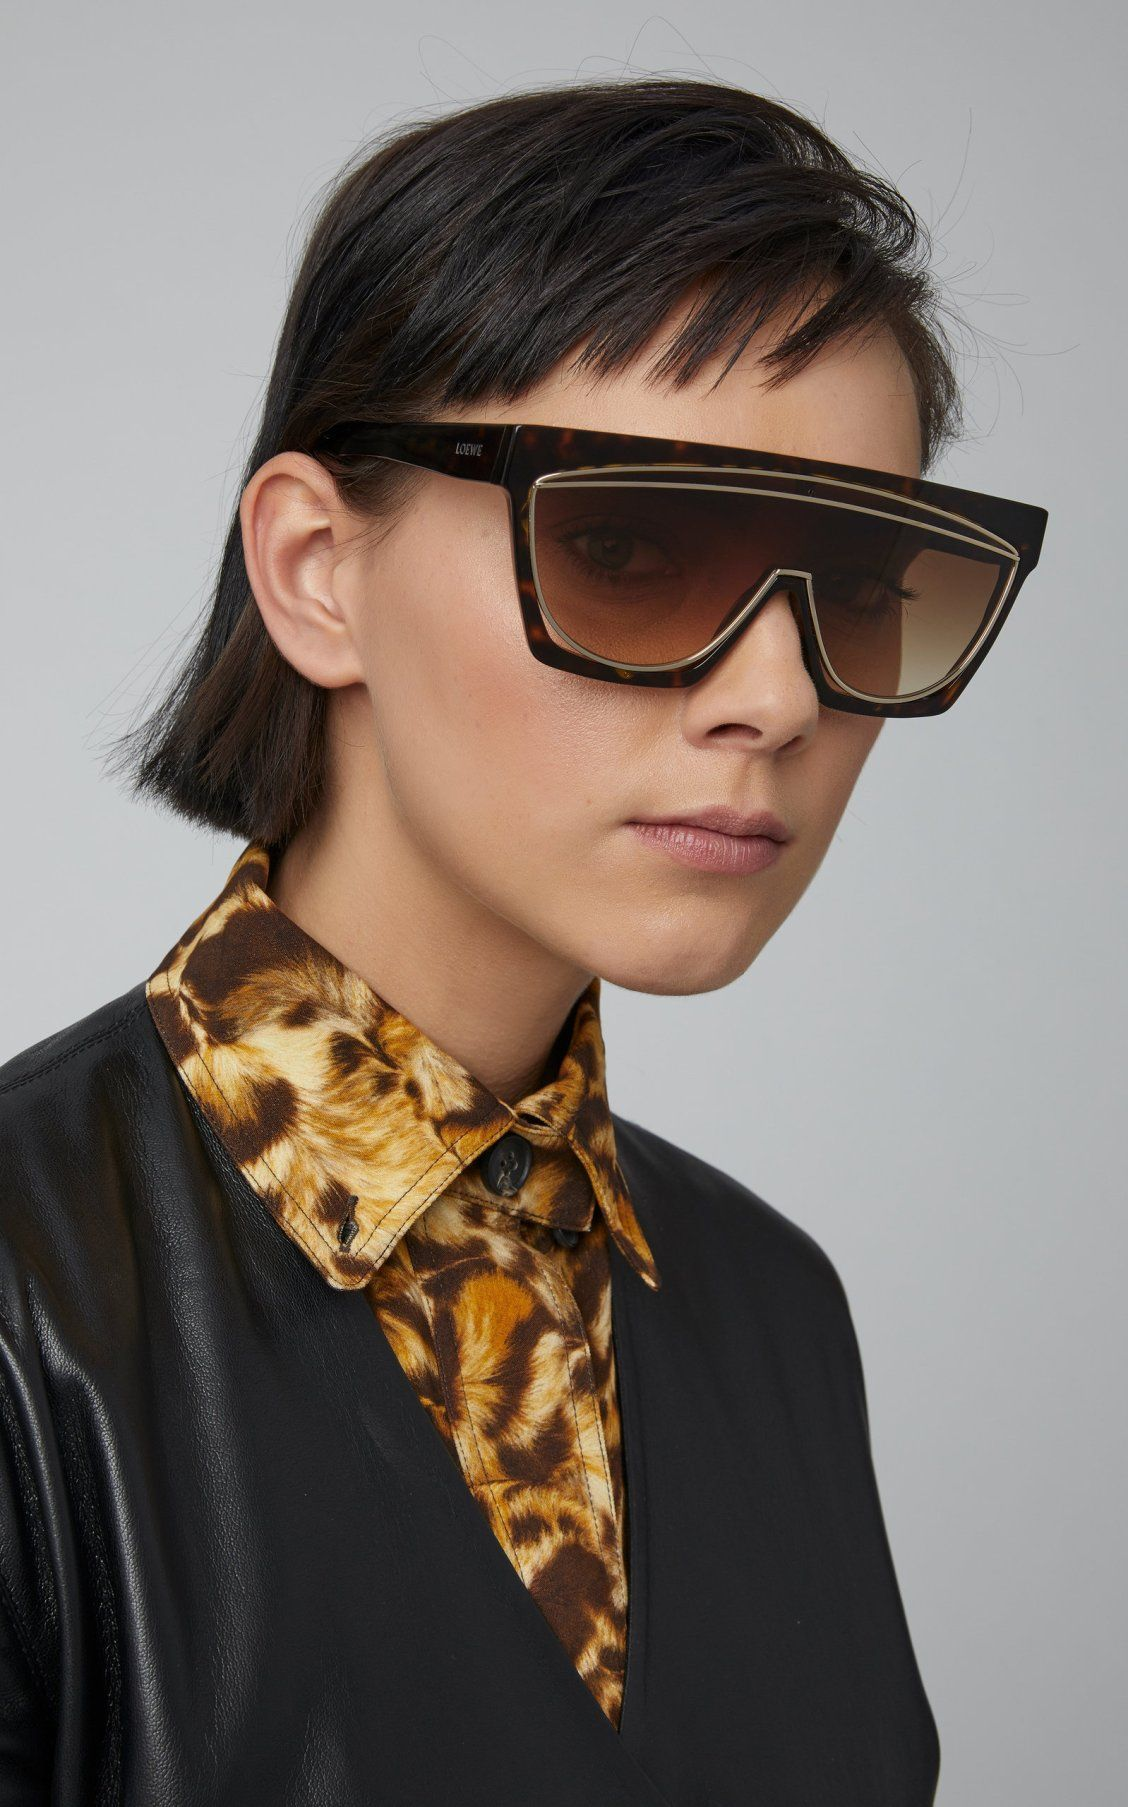 360c62113d Masque Tortoiseshell Acetate Sunglasses by Loewe Sunglasses SS19 ...